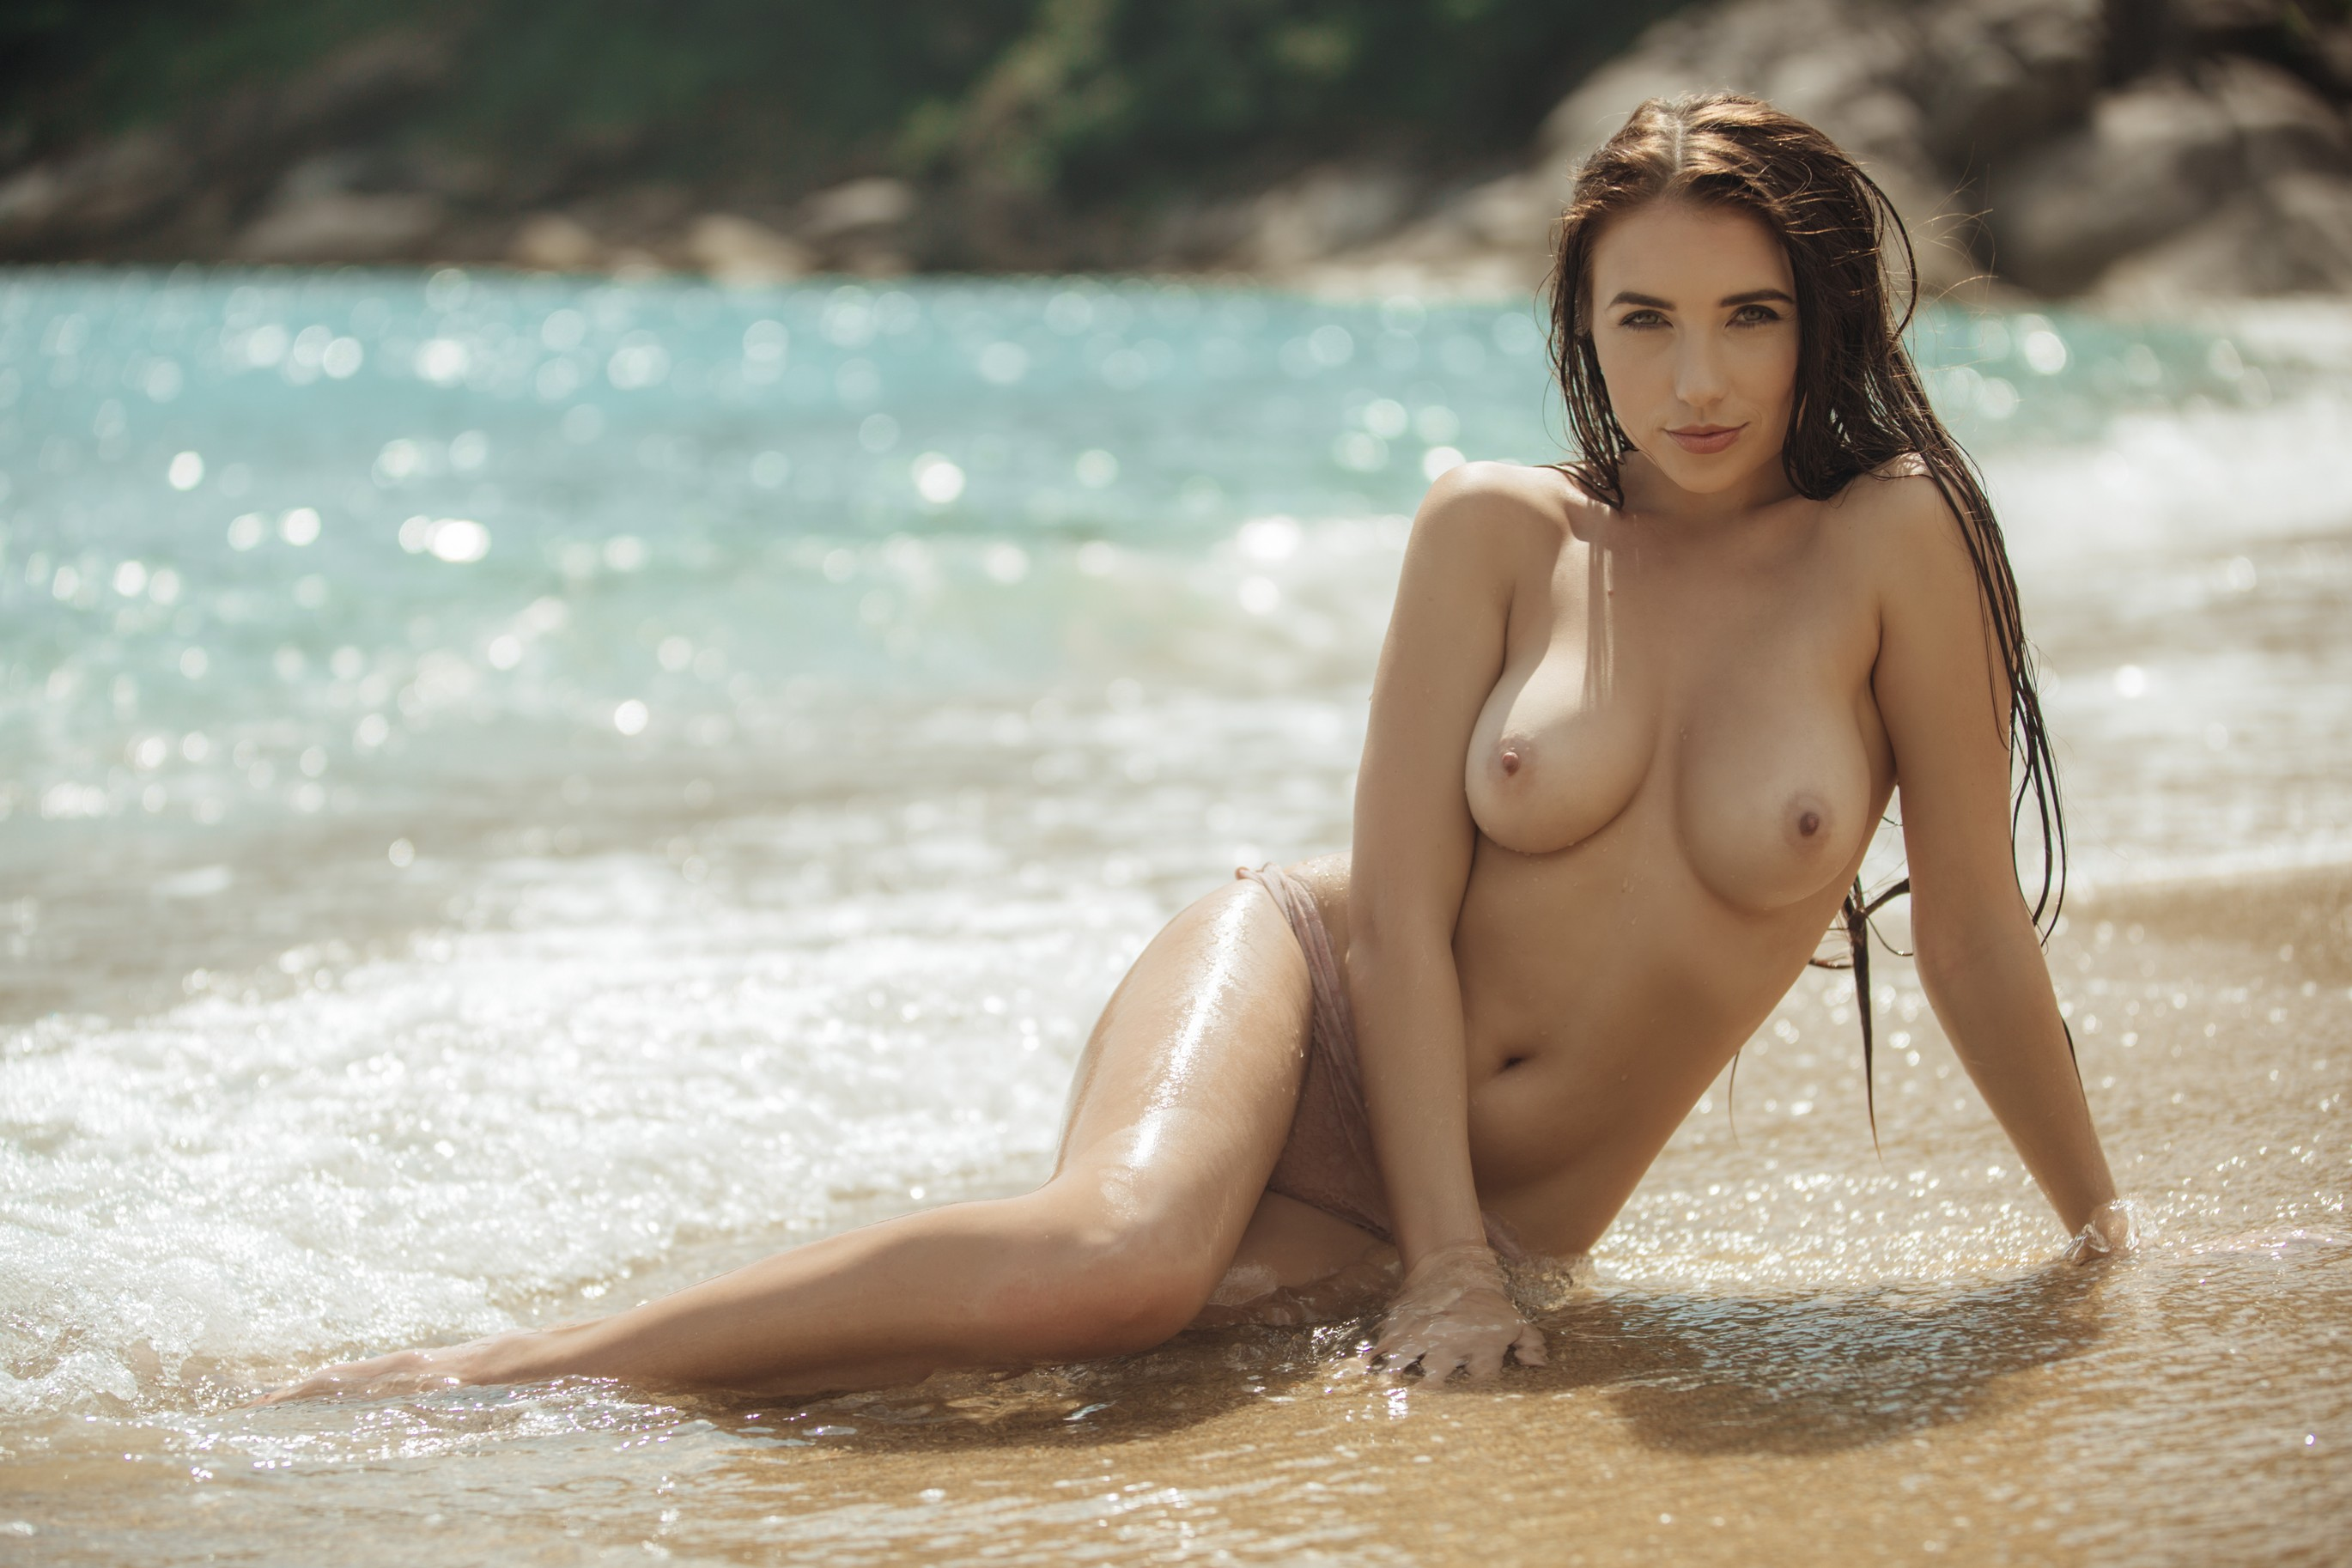 sexiest nude beach